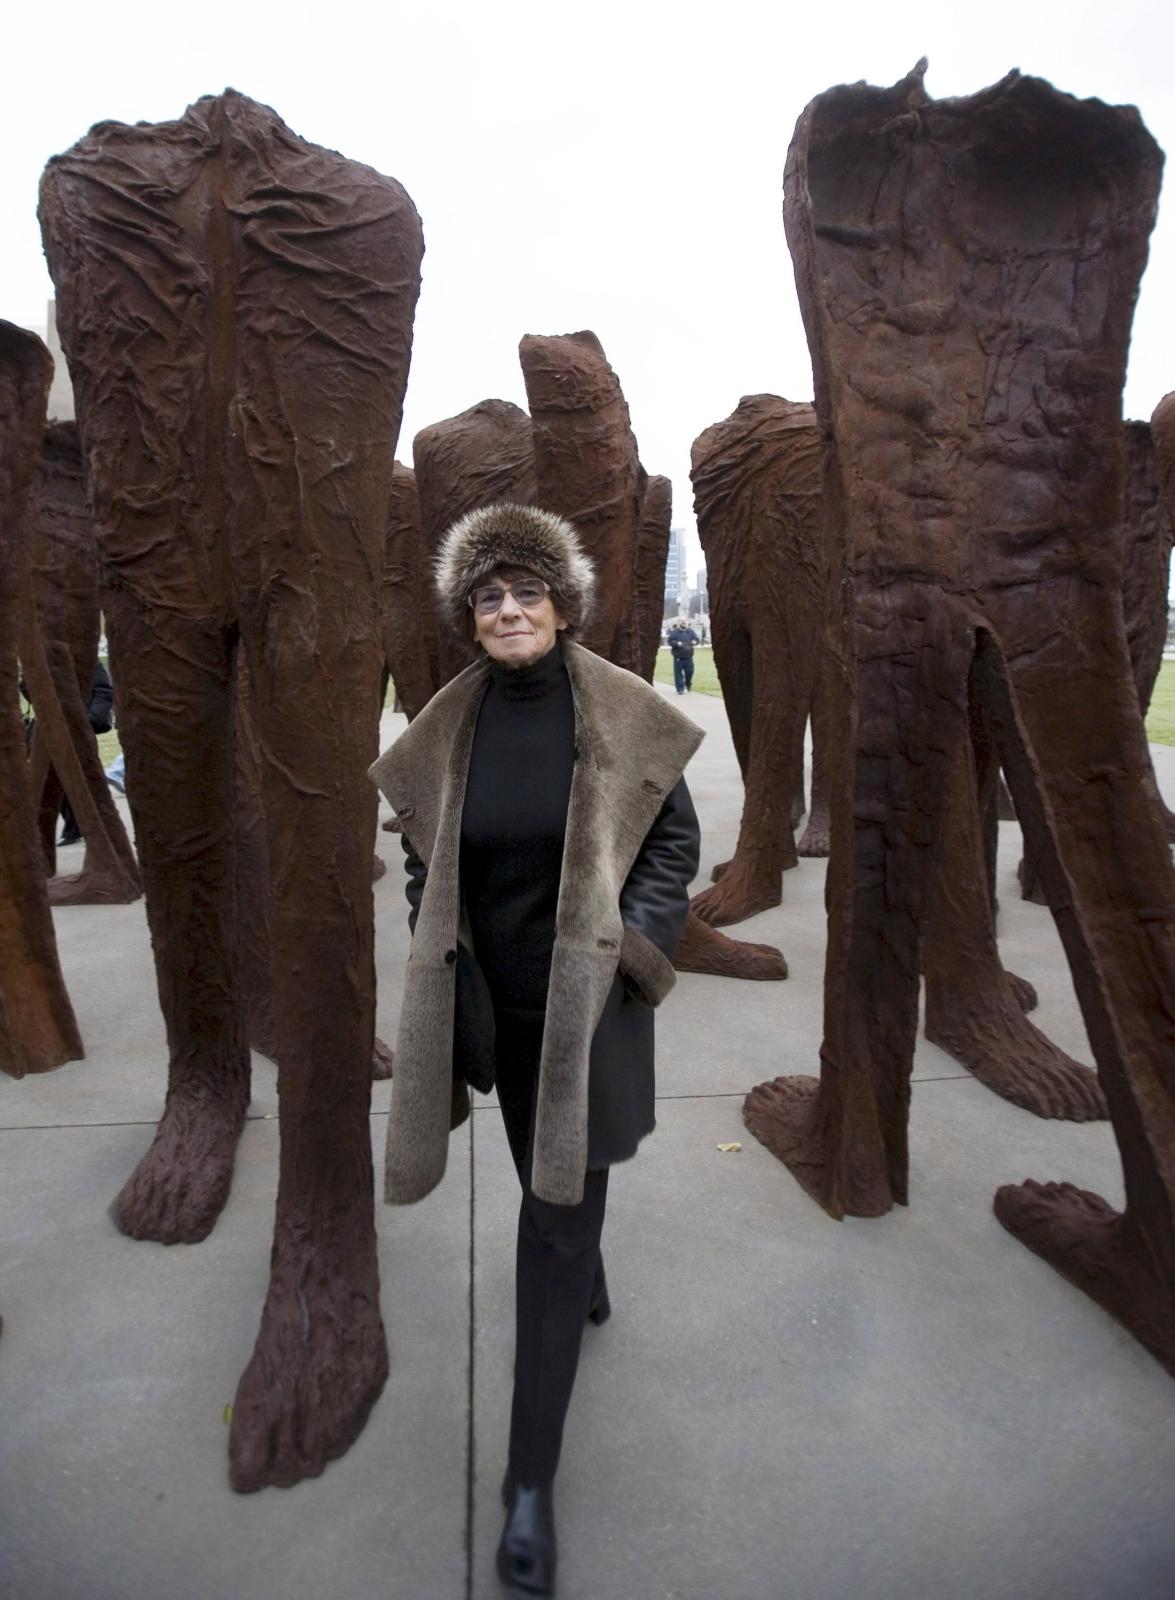 Zmarła artystka Magdalena Abakanowicz. Fot. PAP/EPA/TANNEN MAURY